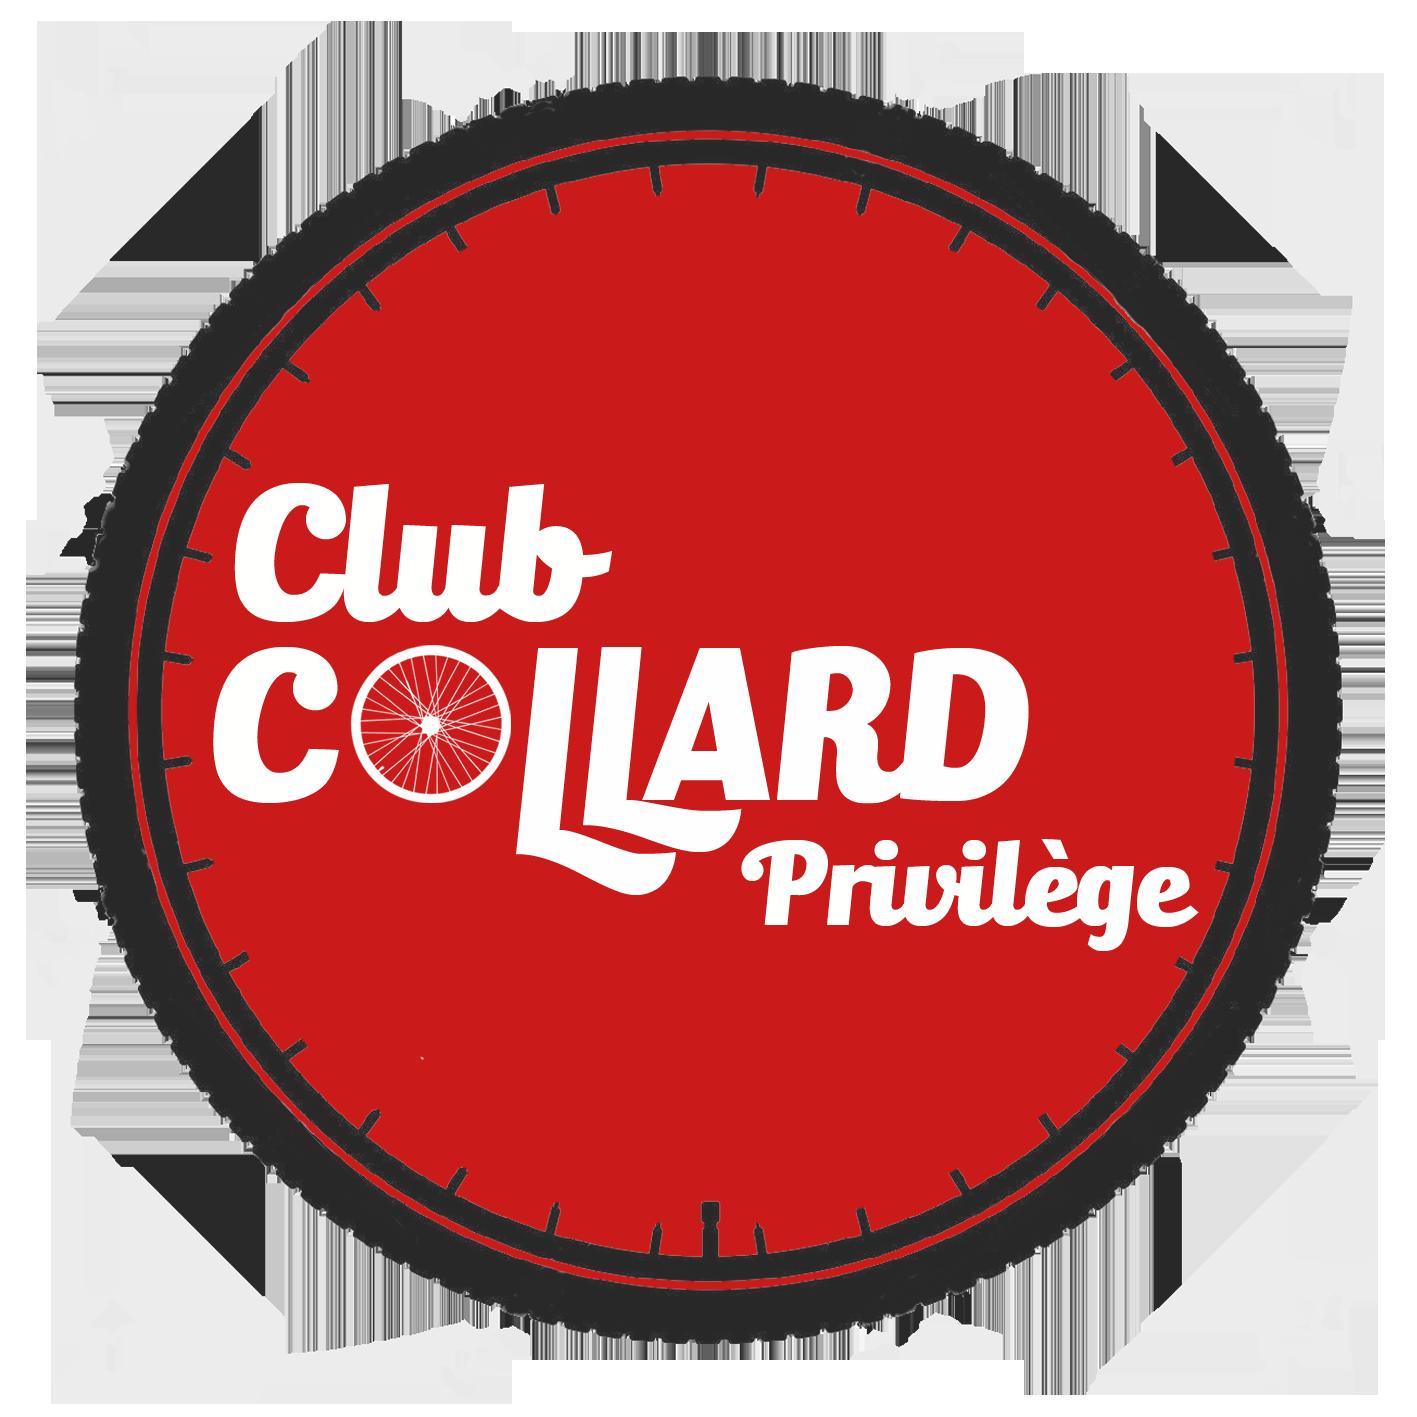 Picto CLUB COLLARD PRIVILEGE copie.png